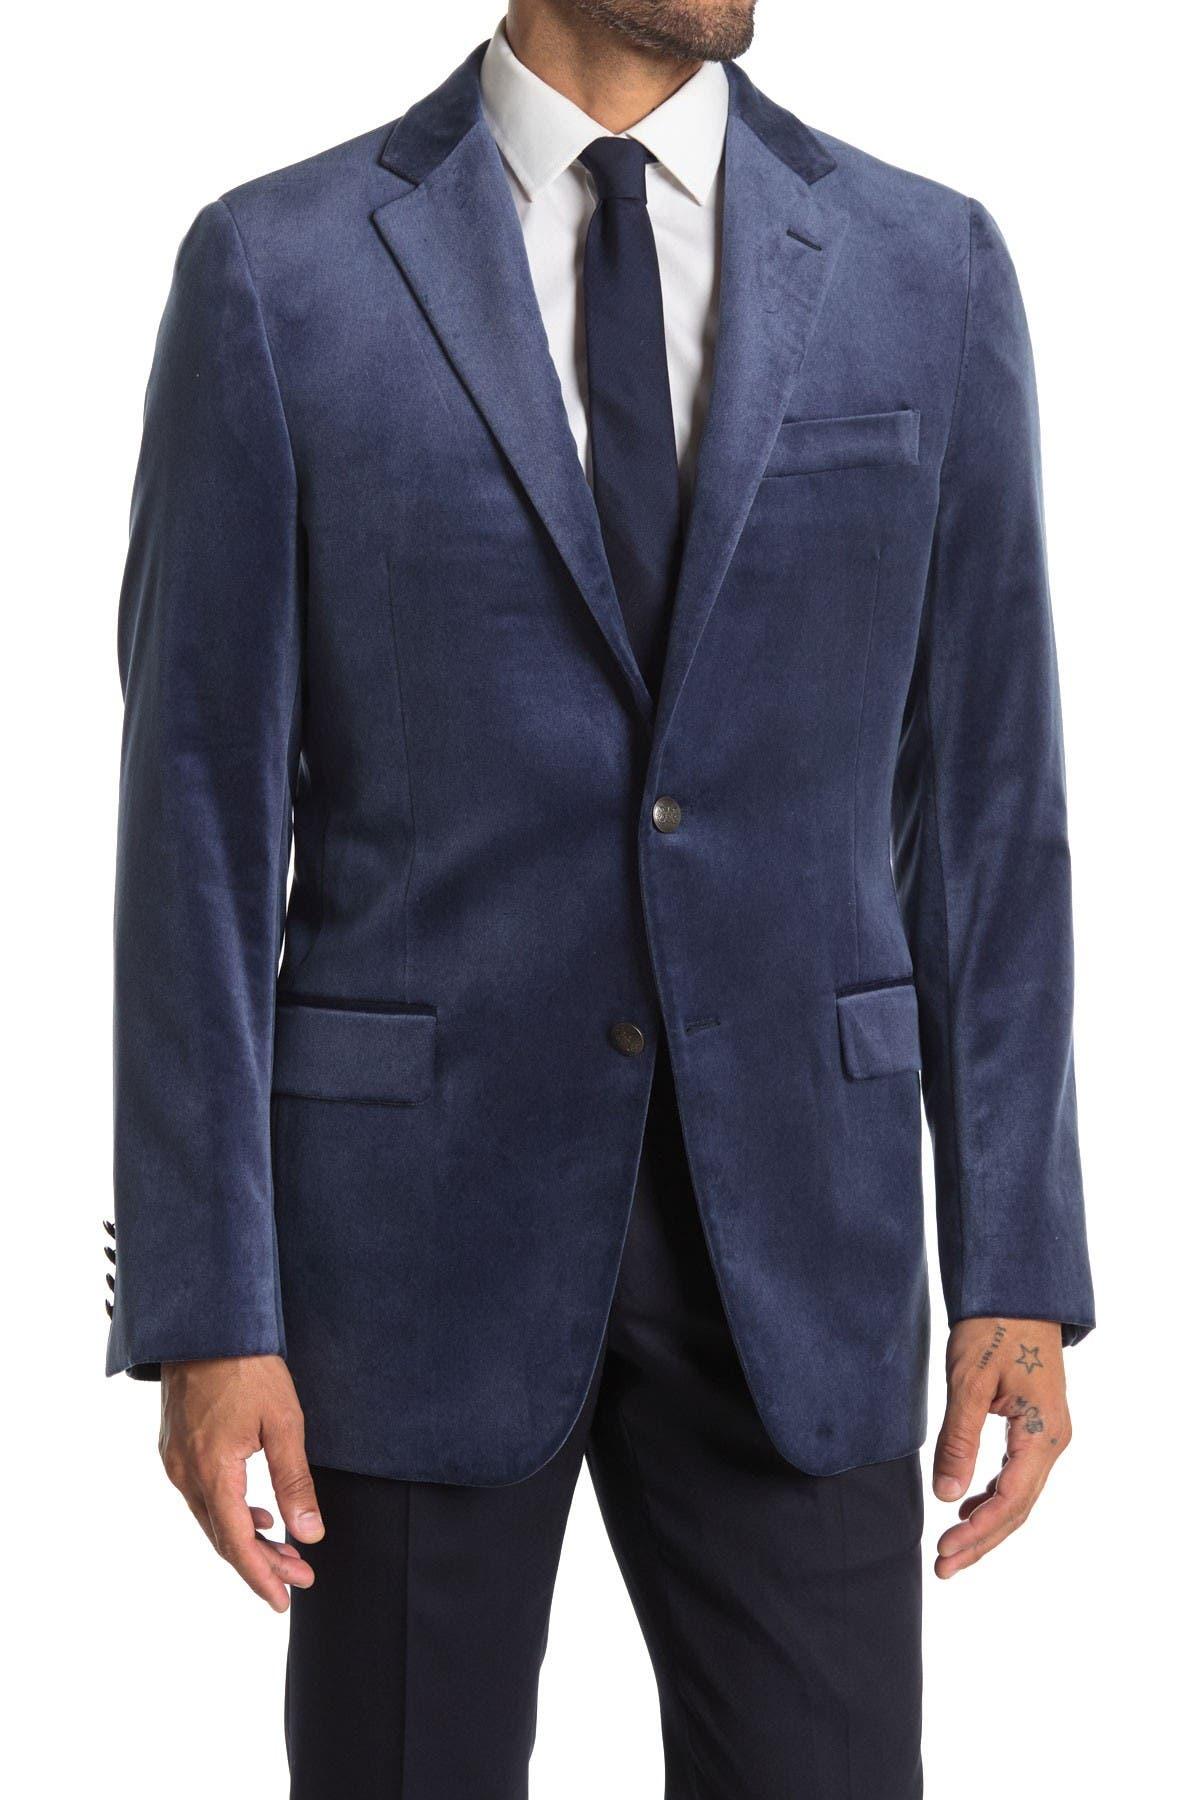 Image of Hickey Freeman Modern Fit Velvet Cashmere Sport Coat